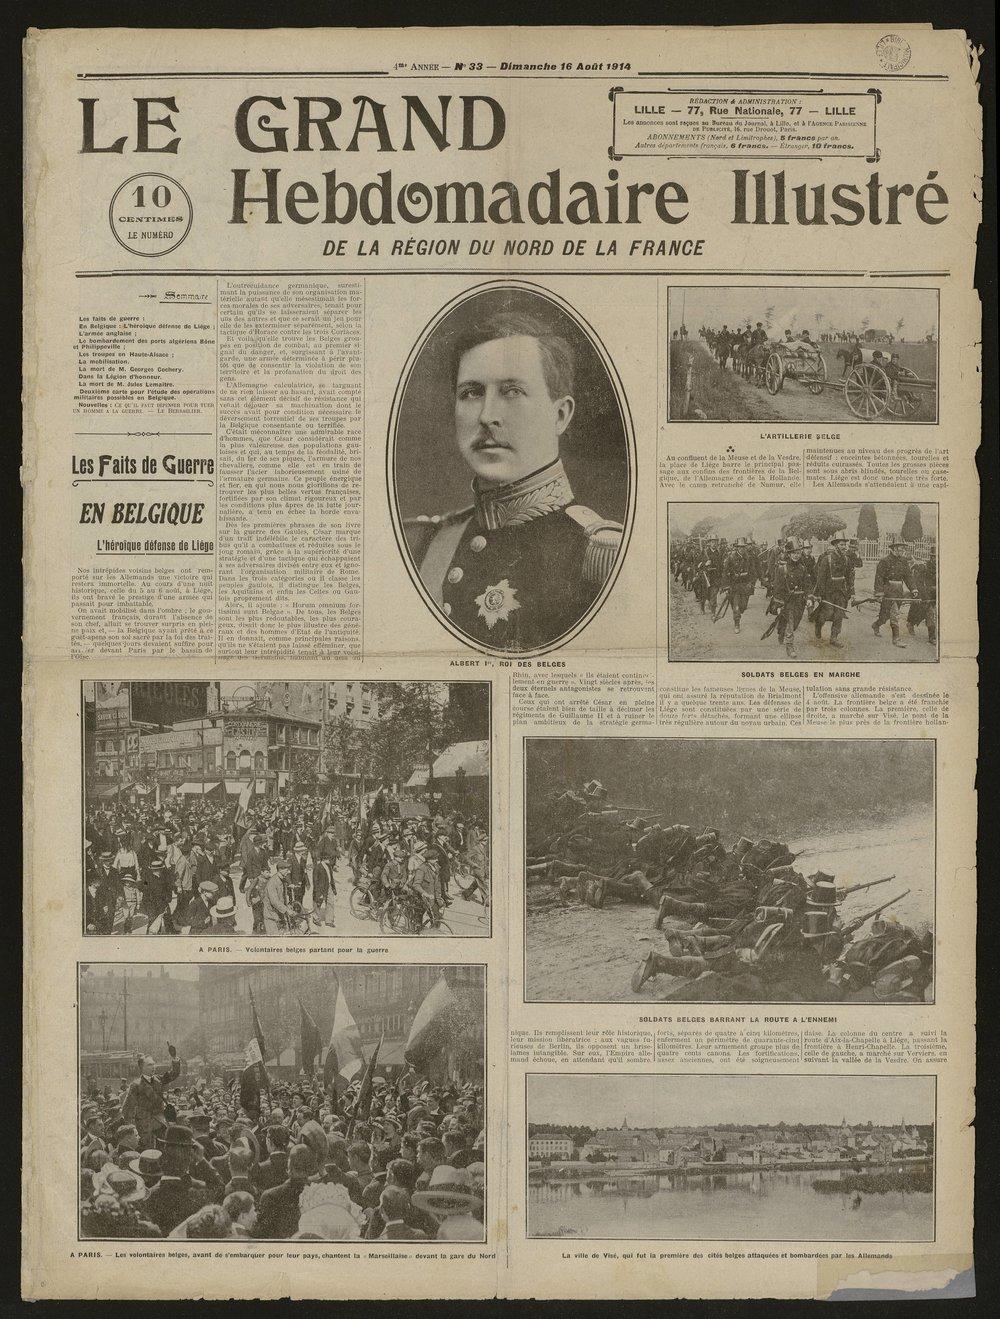 Journal de guerre Dimanche 16 août 1914